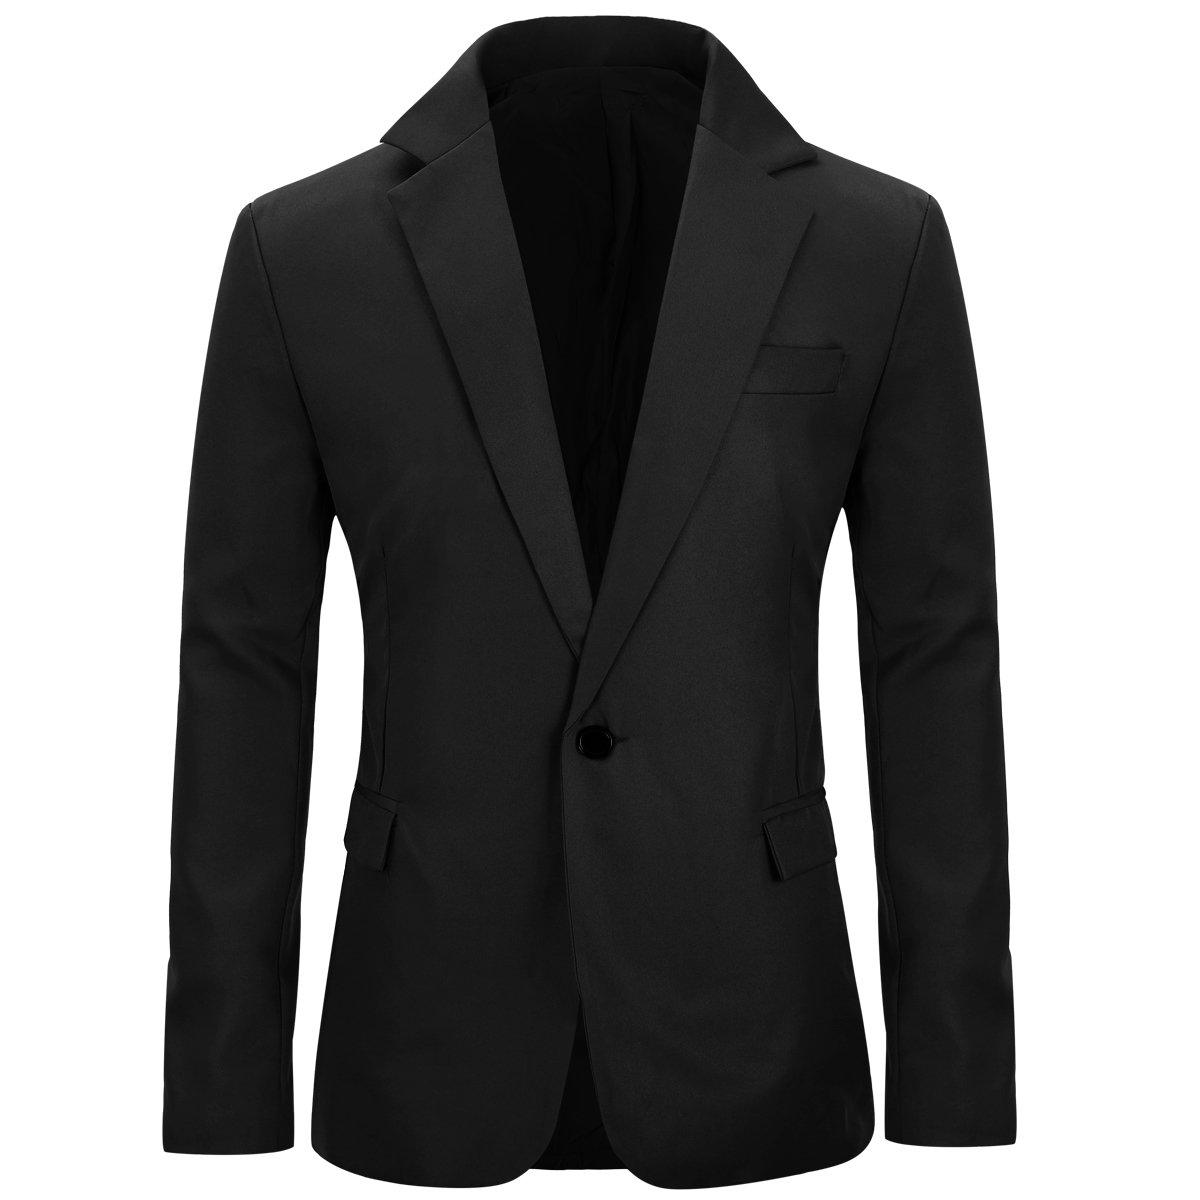 Men's Slim Fit Casual One Button Notched Lapel Blazer Jacket